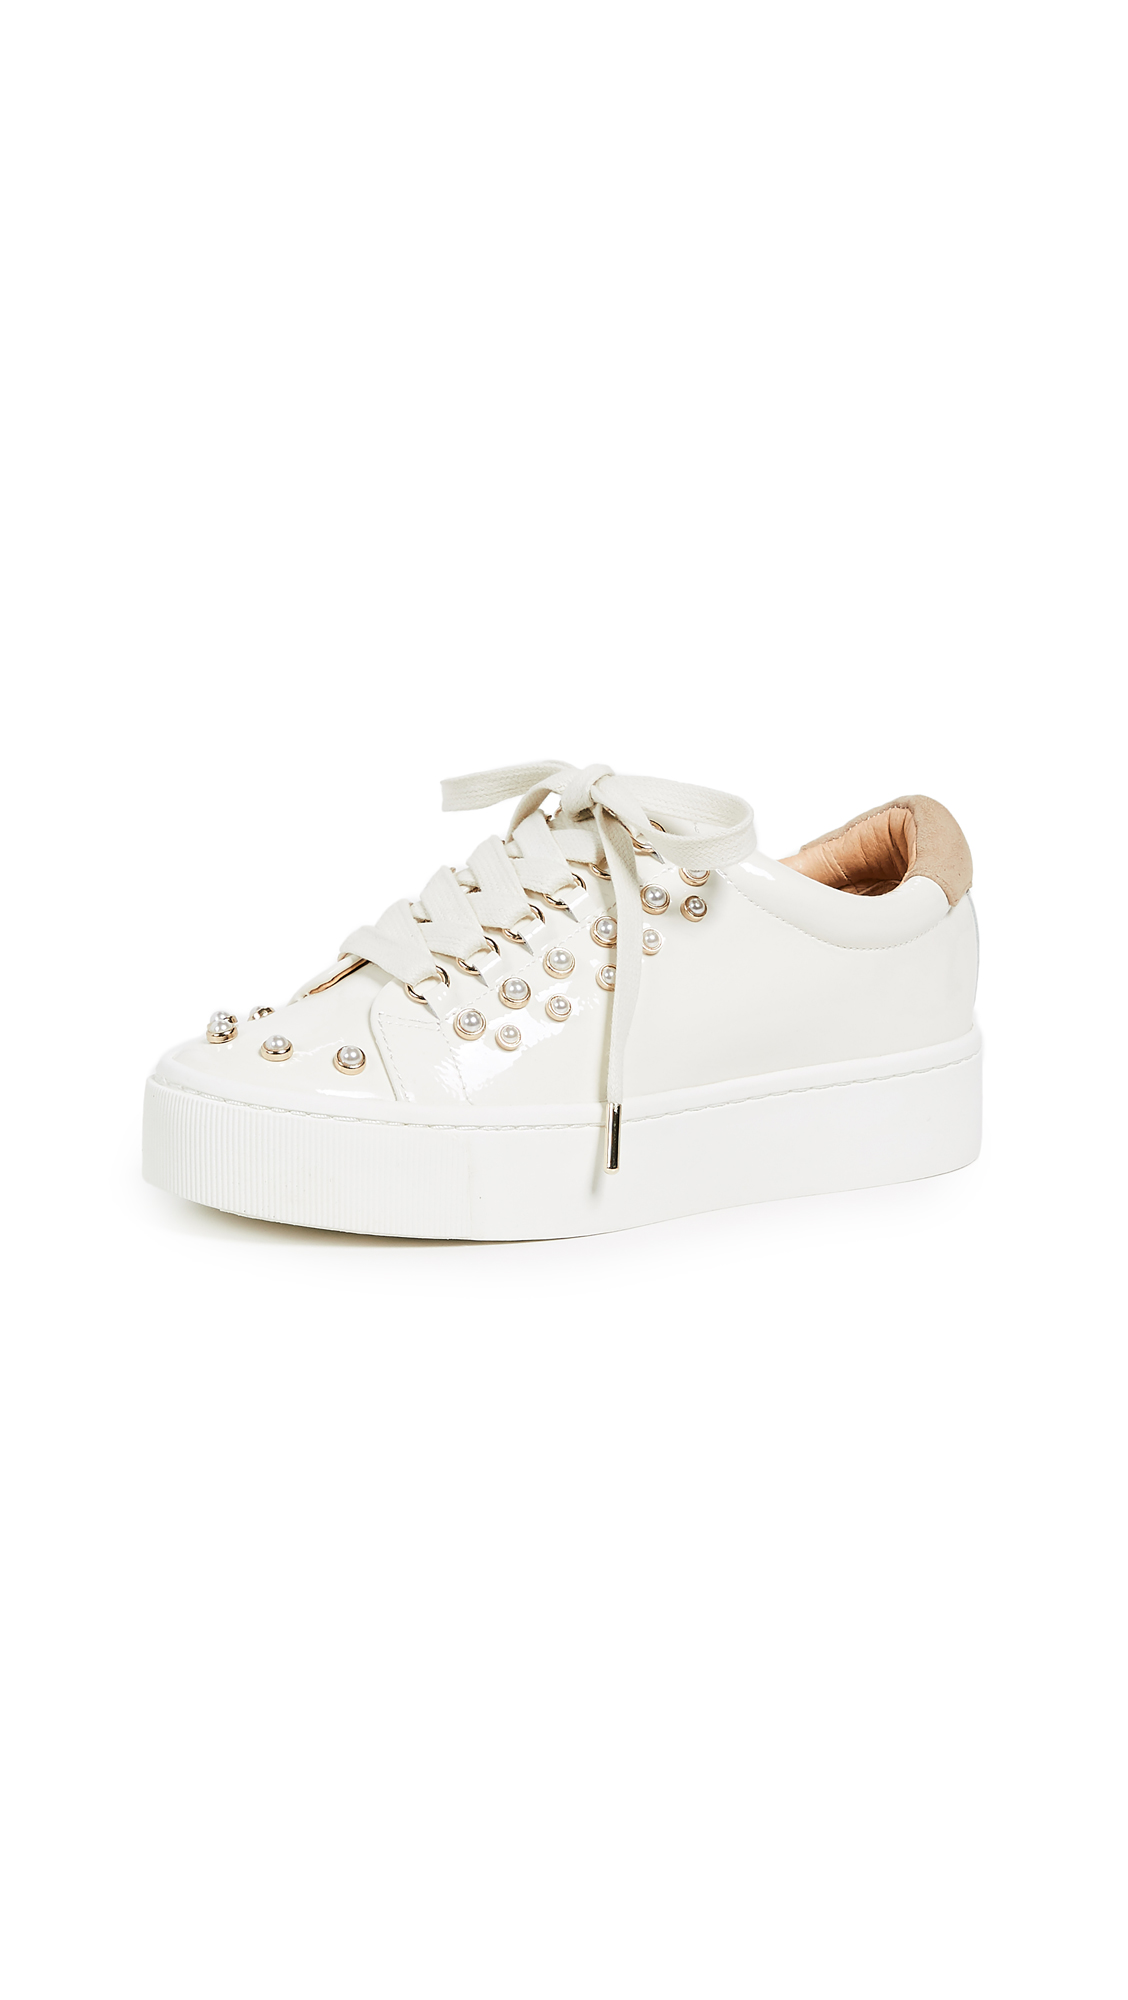 Joie Handan Sneakers - Ivory